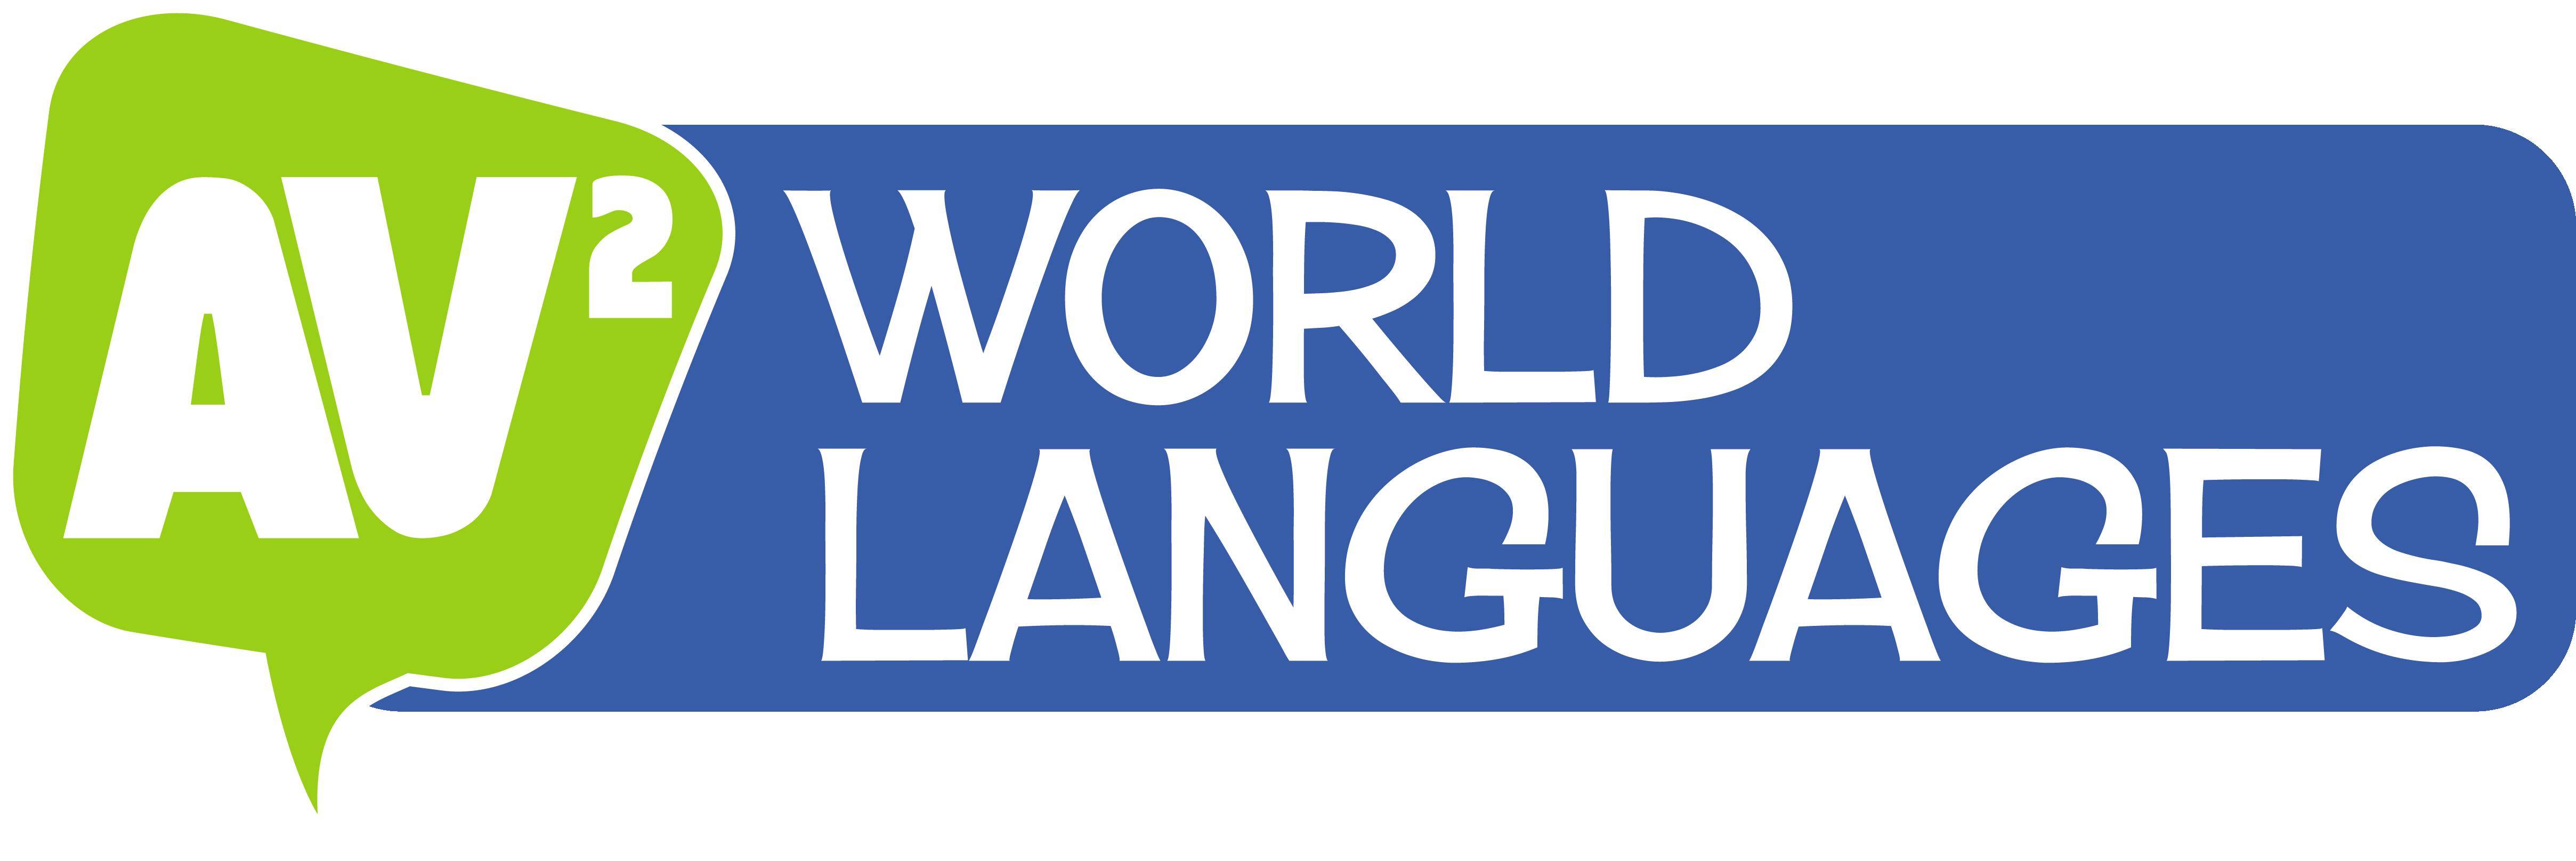 AV2 World Languages (blue badge) logo